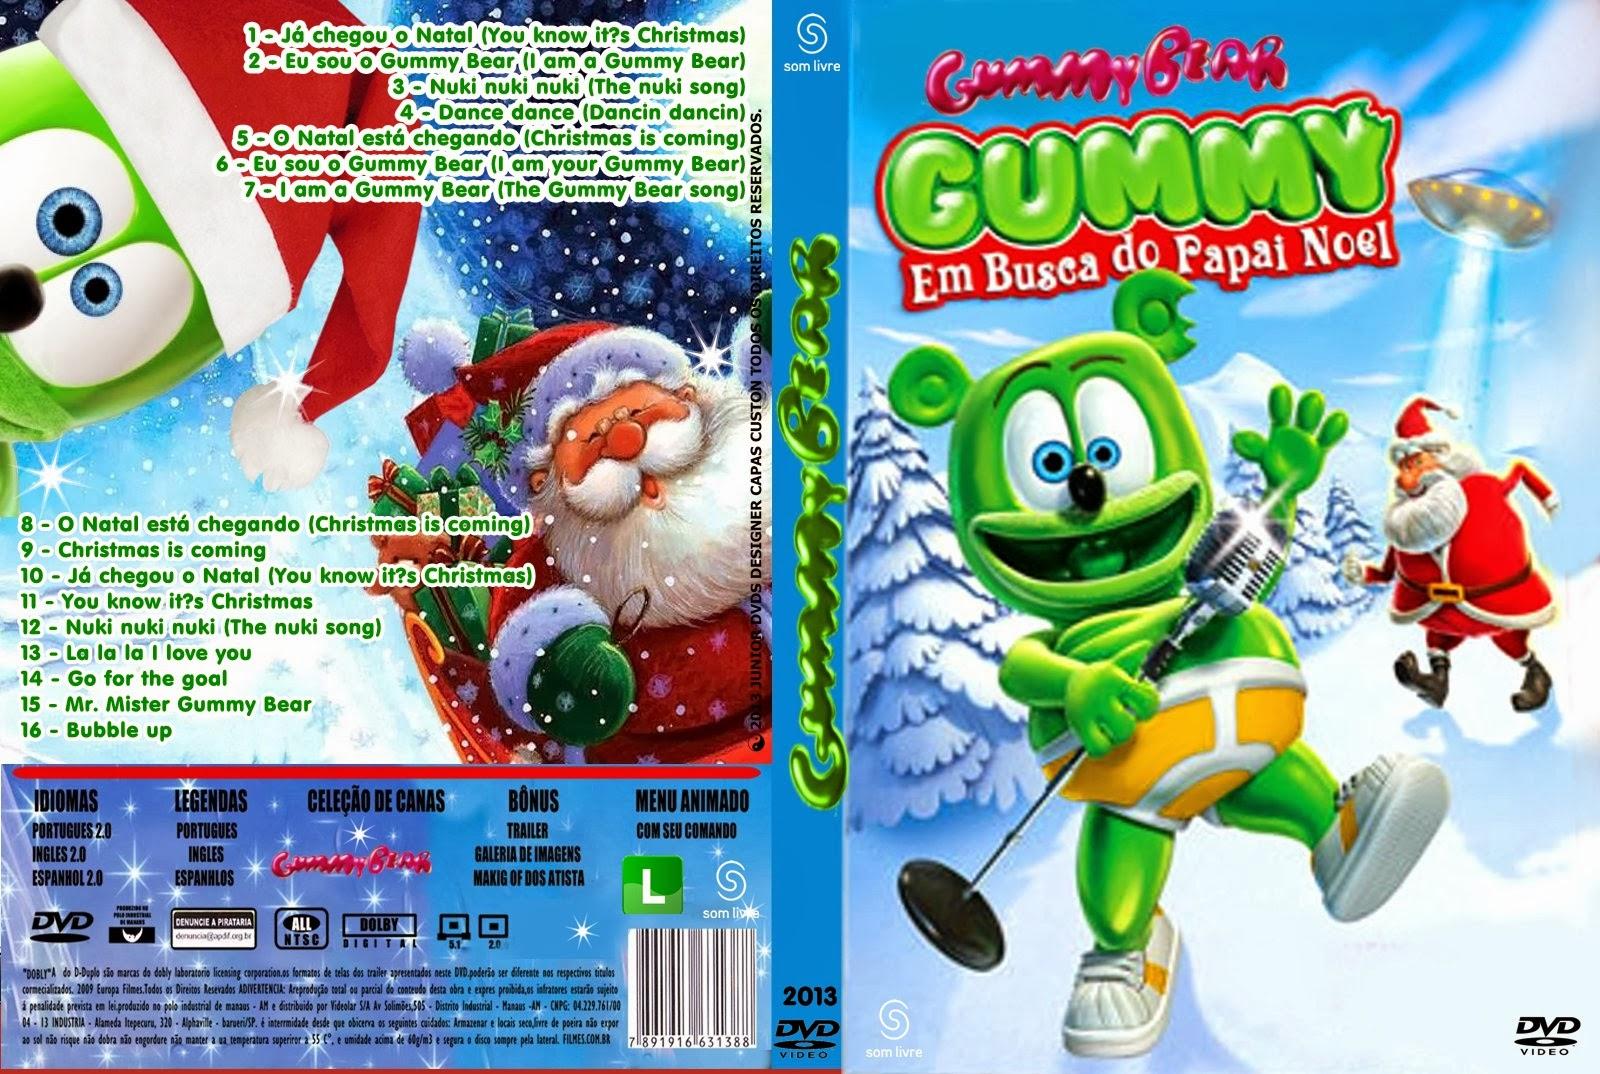 Gummy Em Busca do Papai Noel DVDRip XviD Dublado CAPA DO DVD GUMMY BEER   EM BUSCA DO PAPAI NOEL   JUNIOR DVDS DESIGNER